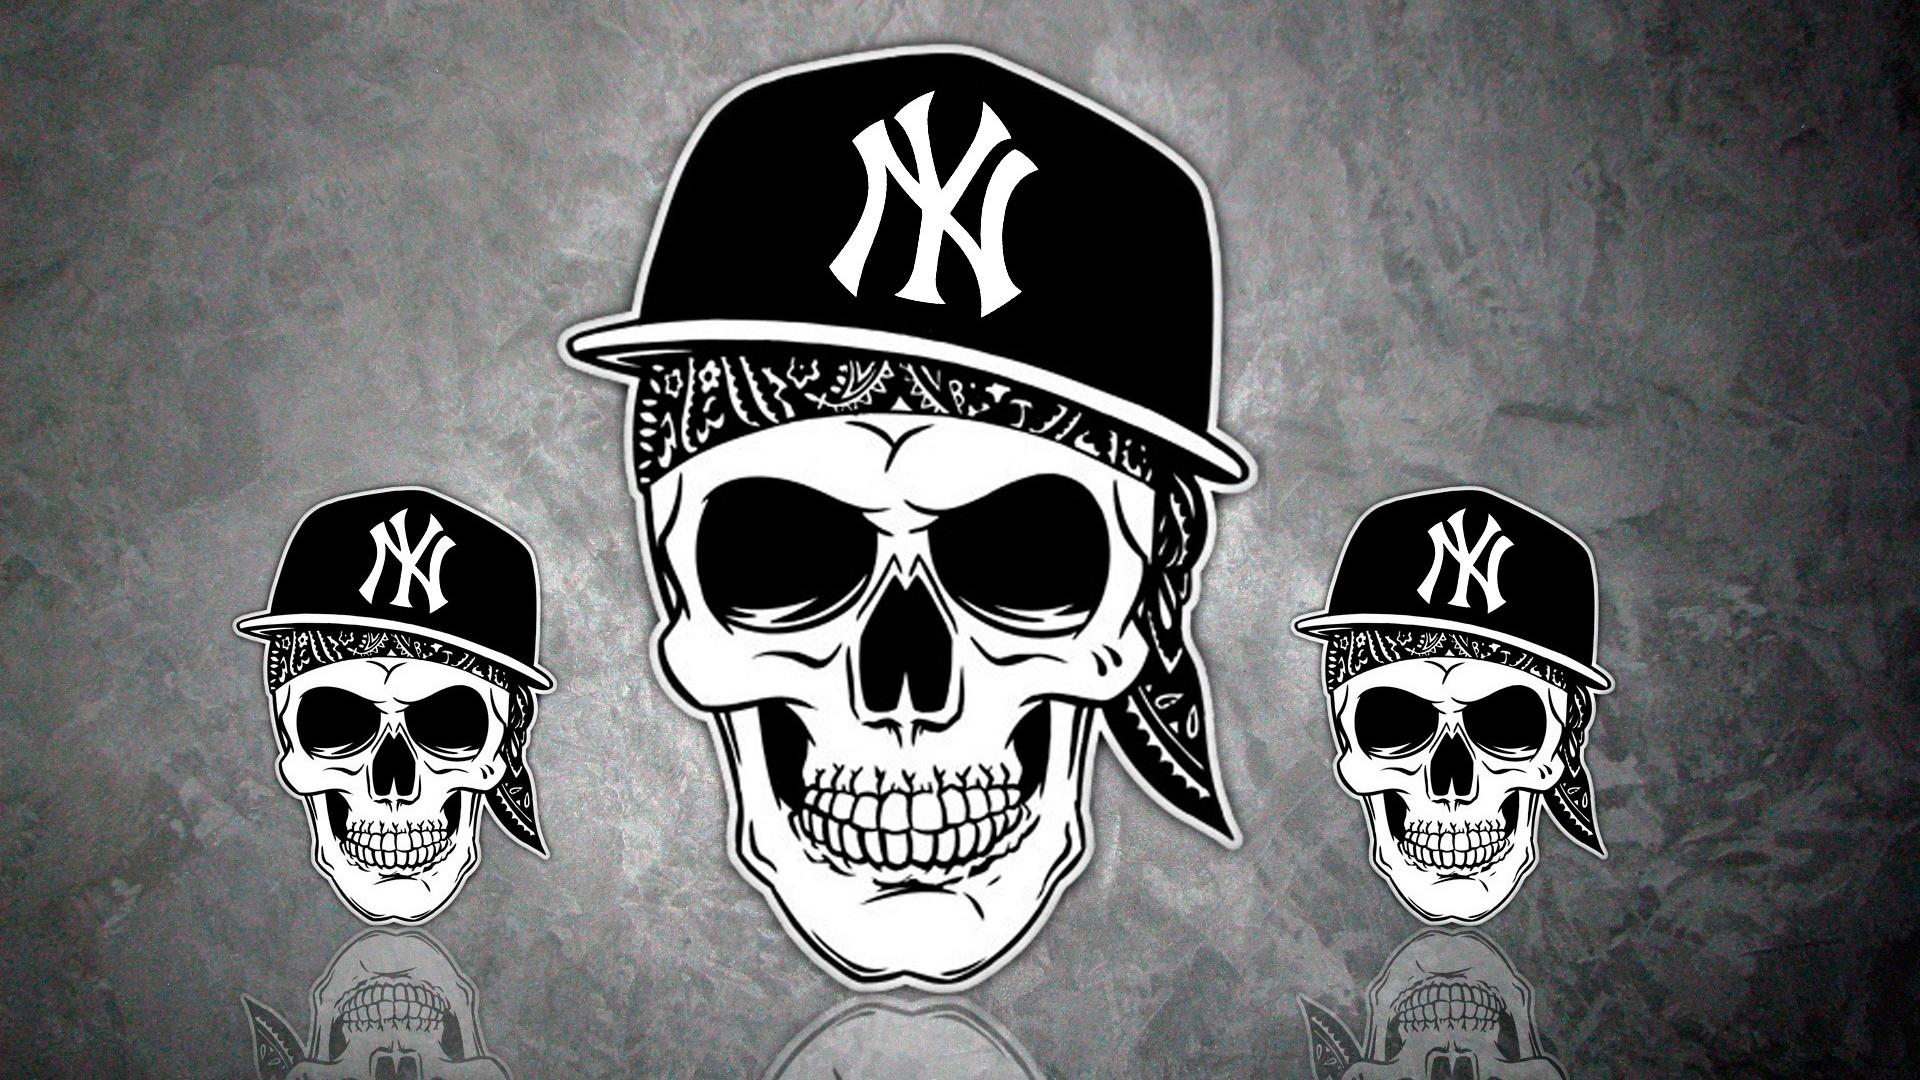 rap wallpaper HD 1920x1080